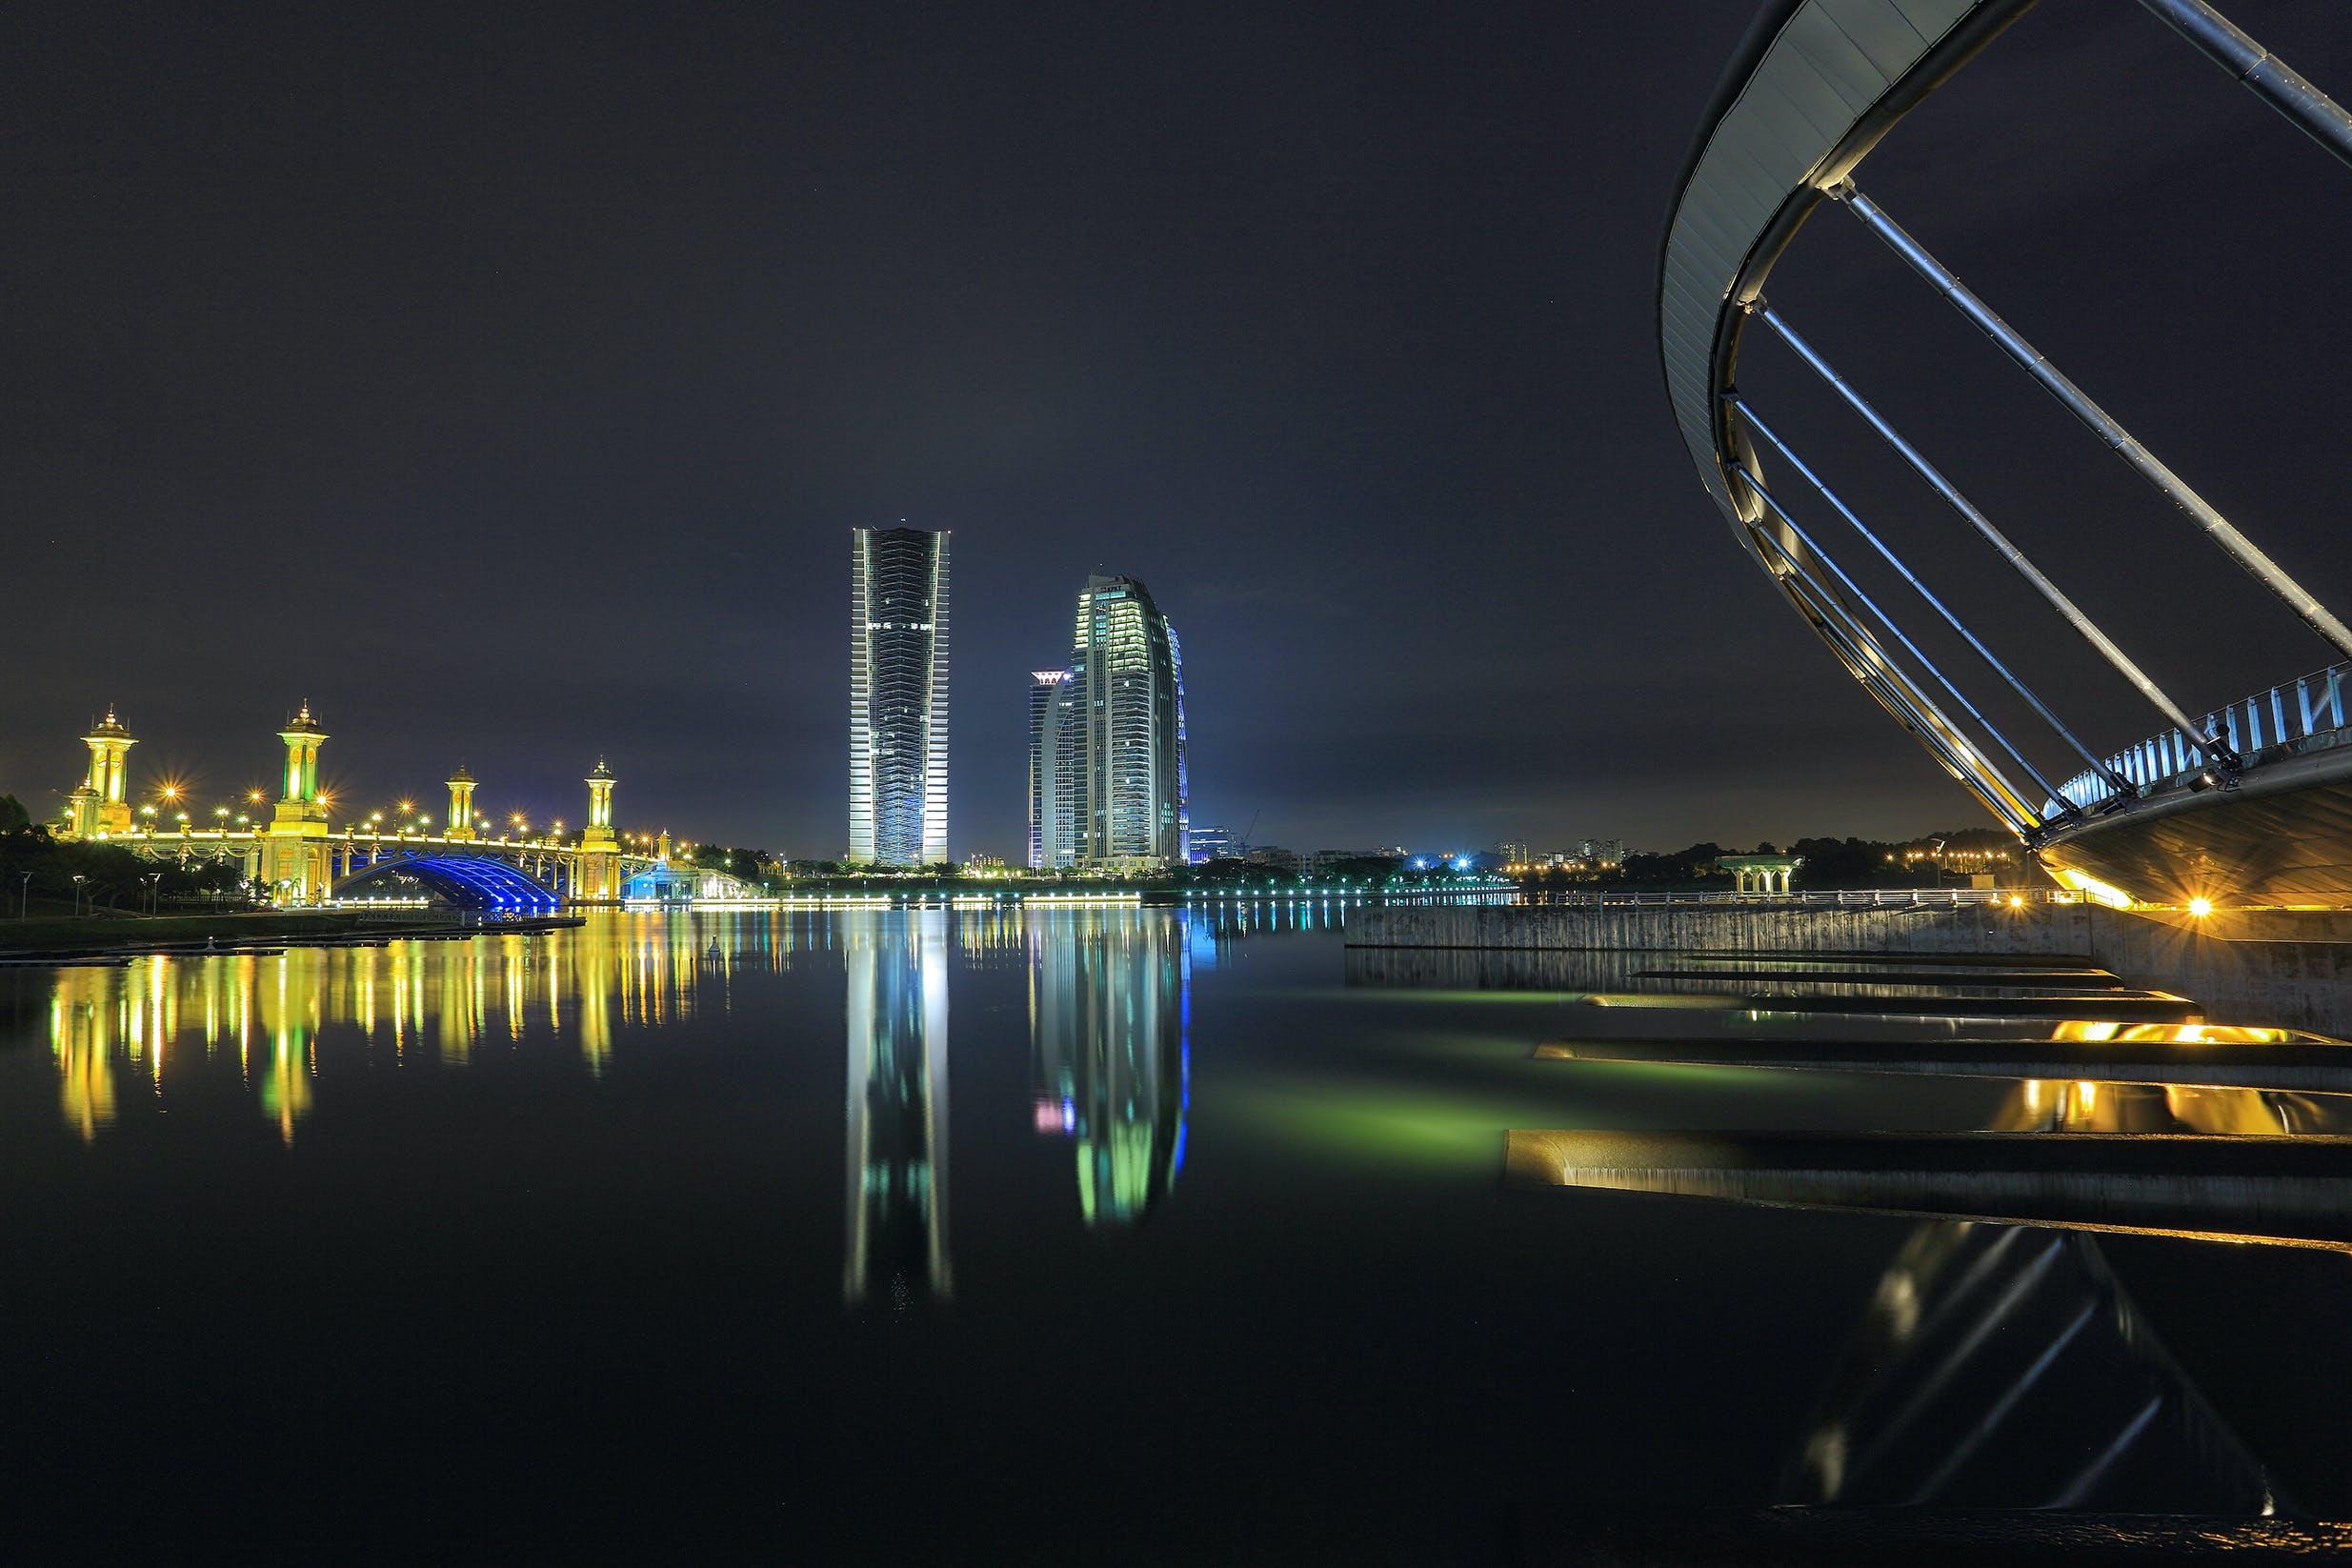 Kostnadsfri bild av arkitektur, bro, byggnader, horisont